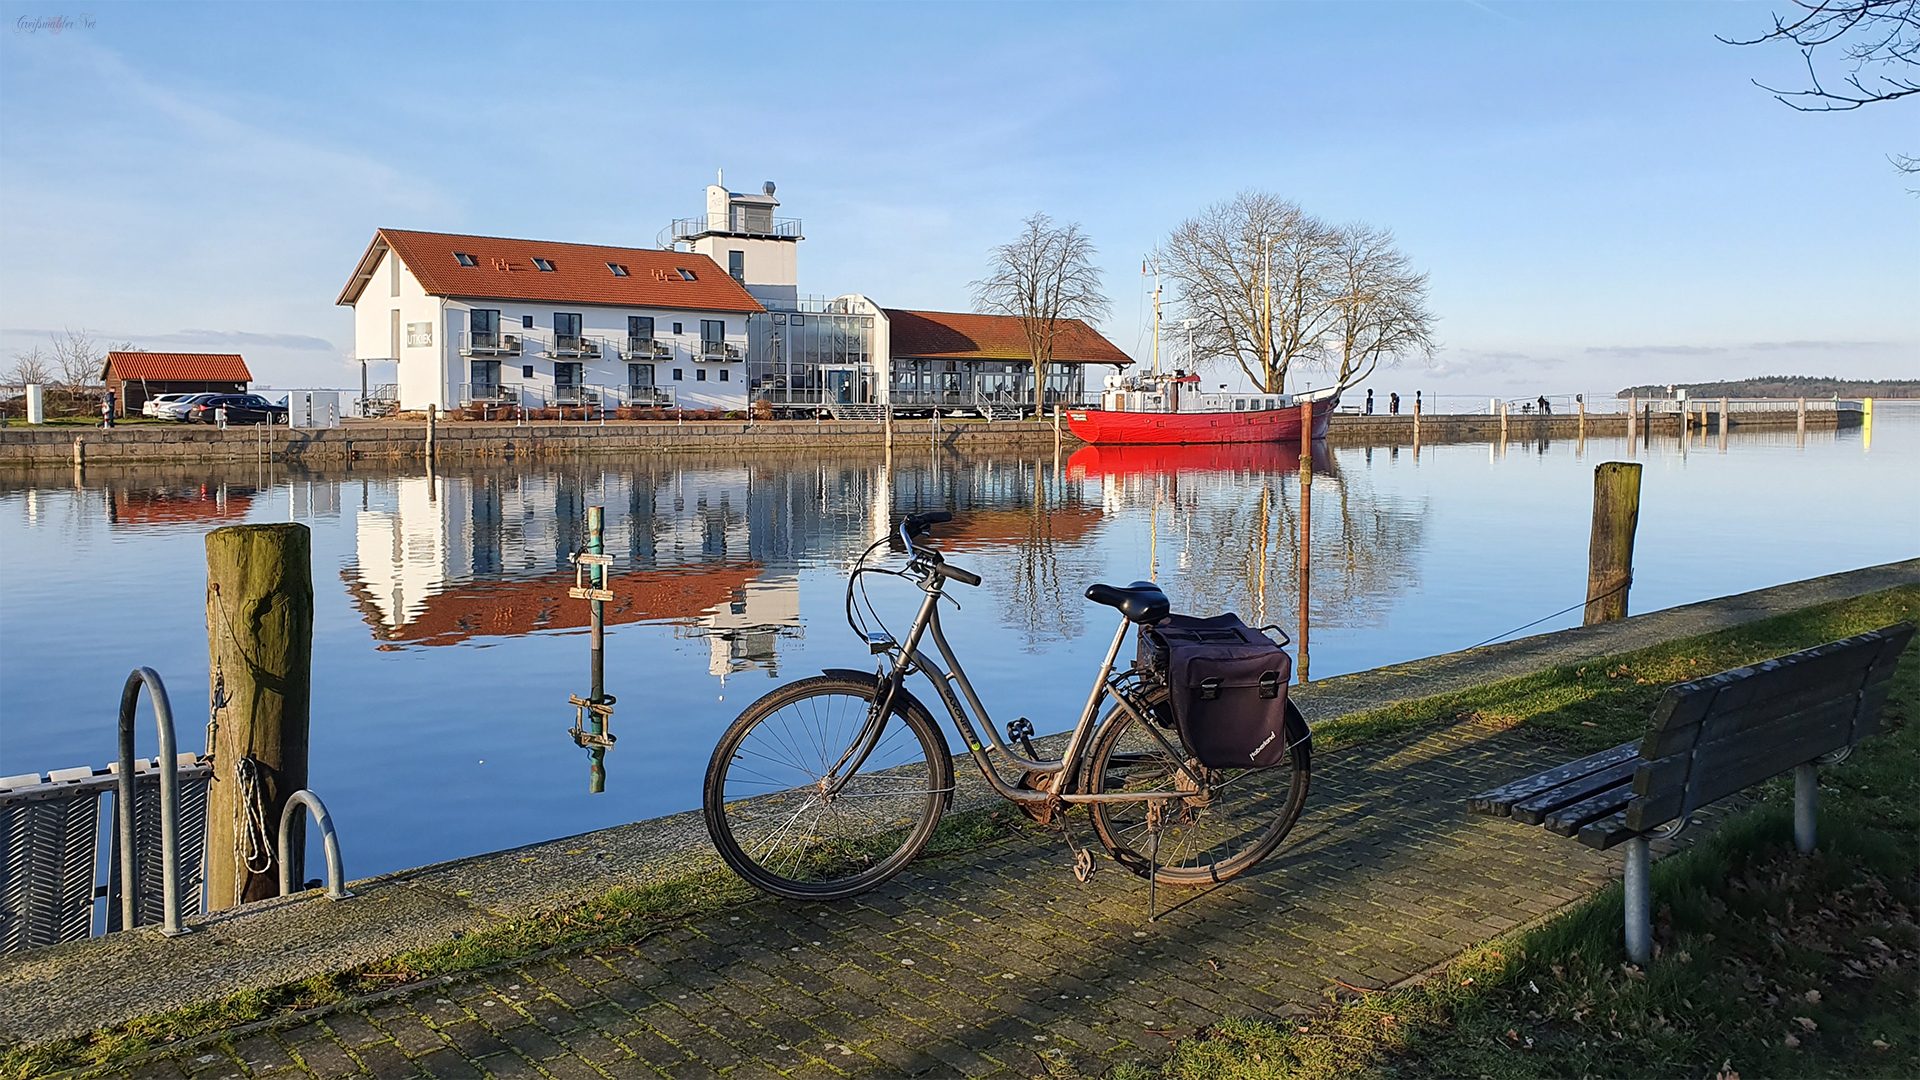 Frühlingshaftes Wetter am Ryck in Greifswald-Wieck